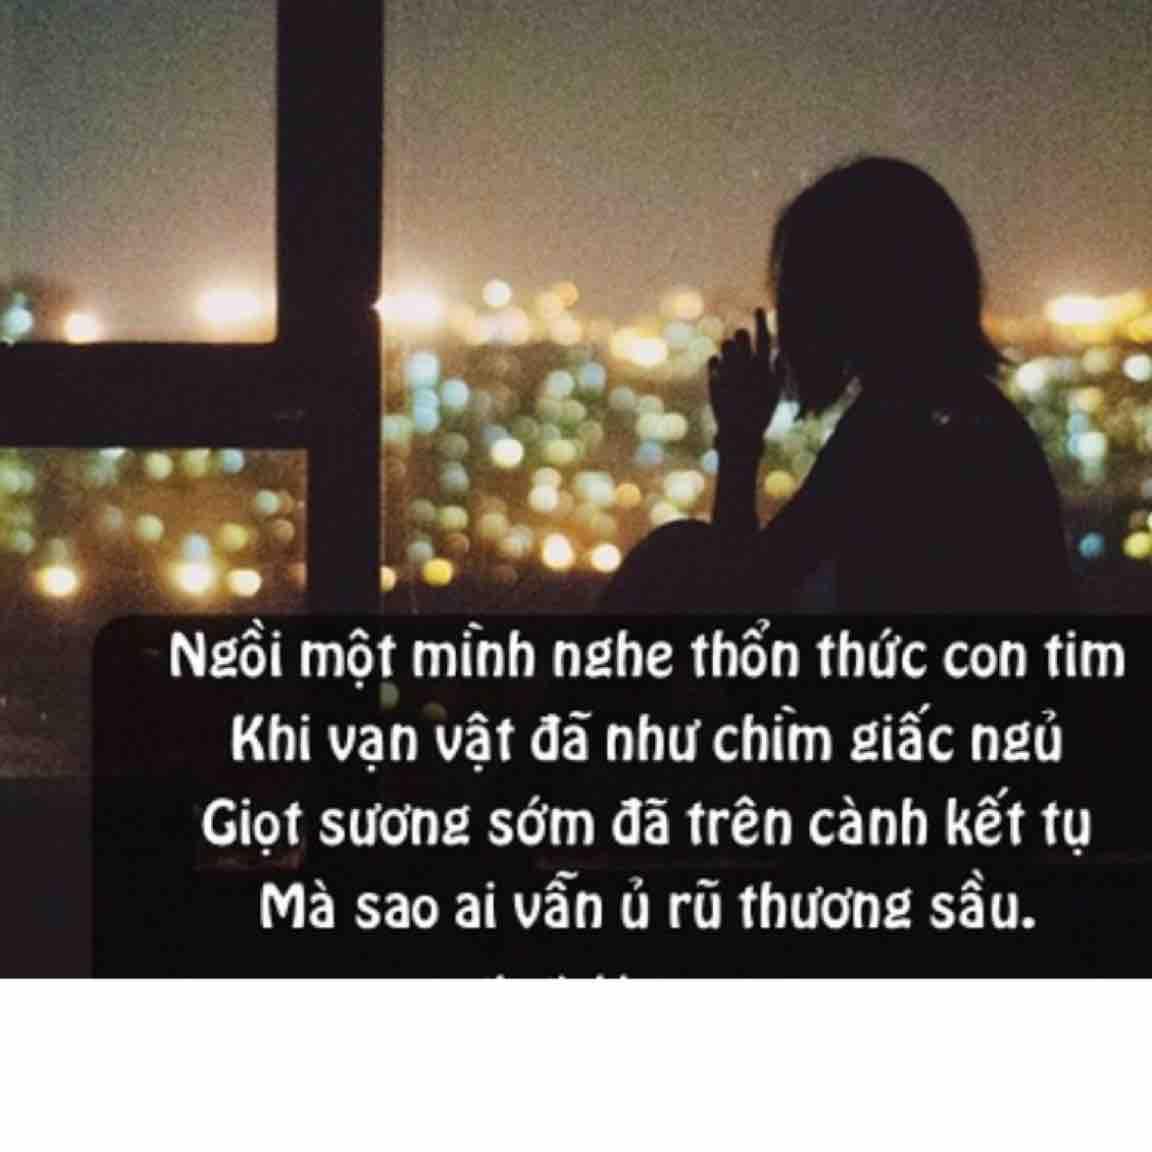 [Karaoke] HẬN ĐỒ BÀN _ Tone Nữ | Karaoke By Ha Thu